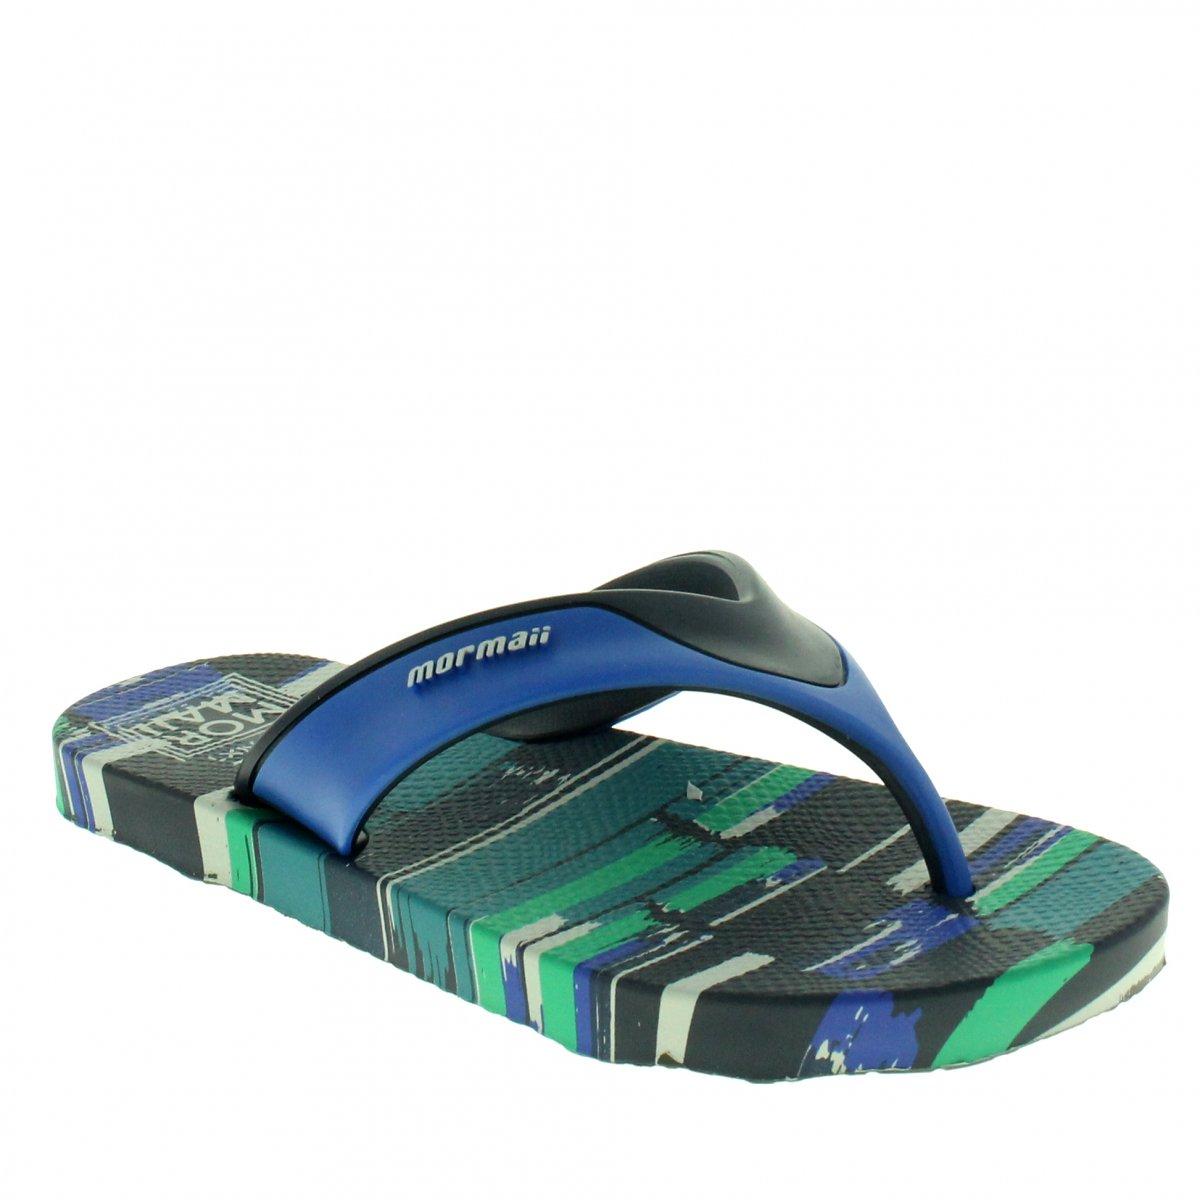 325a6403e Chinelo Mormaii Neocycle 10897 | Azul/azul | Coutope